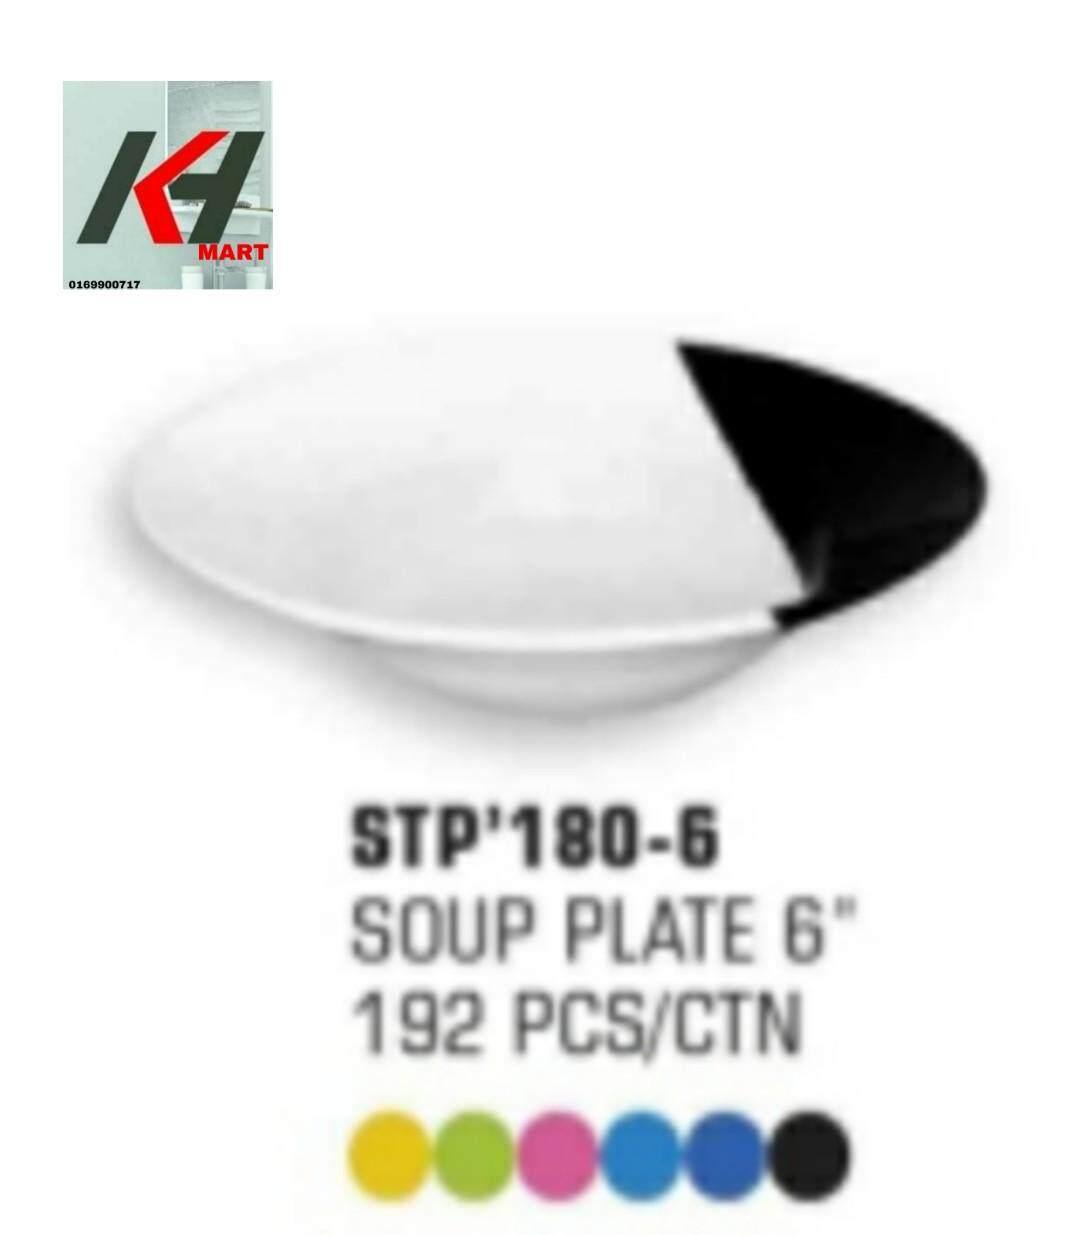 MELAMINE / MILAMINE TWO TONE SOUP PLATE 6    1 PCS READY STOCK